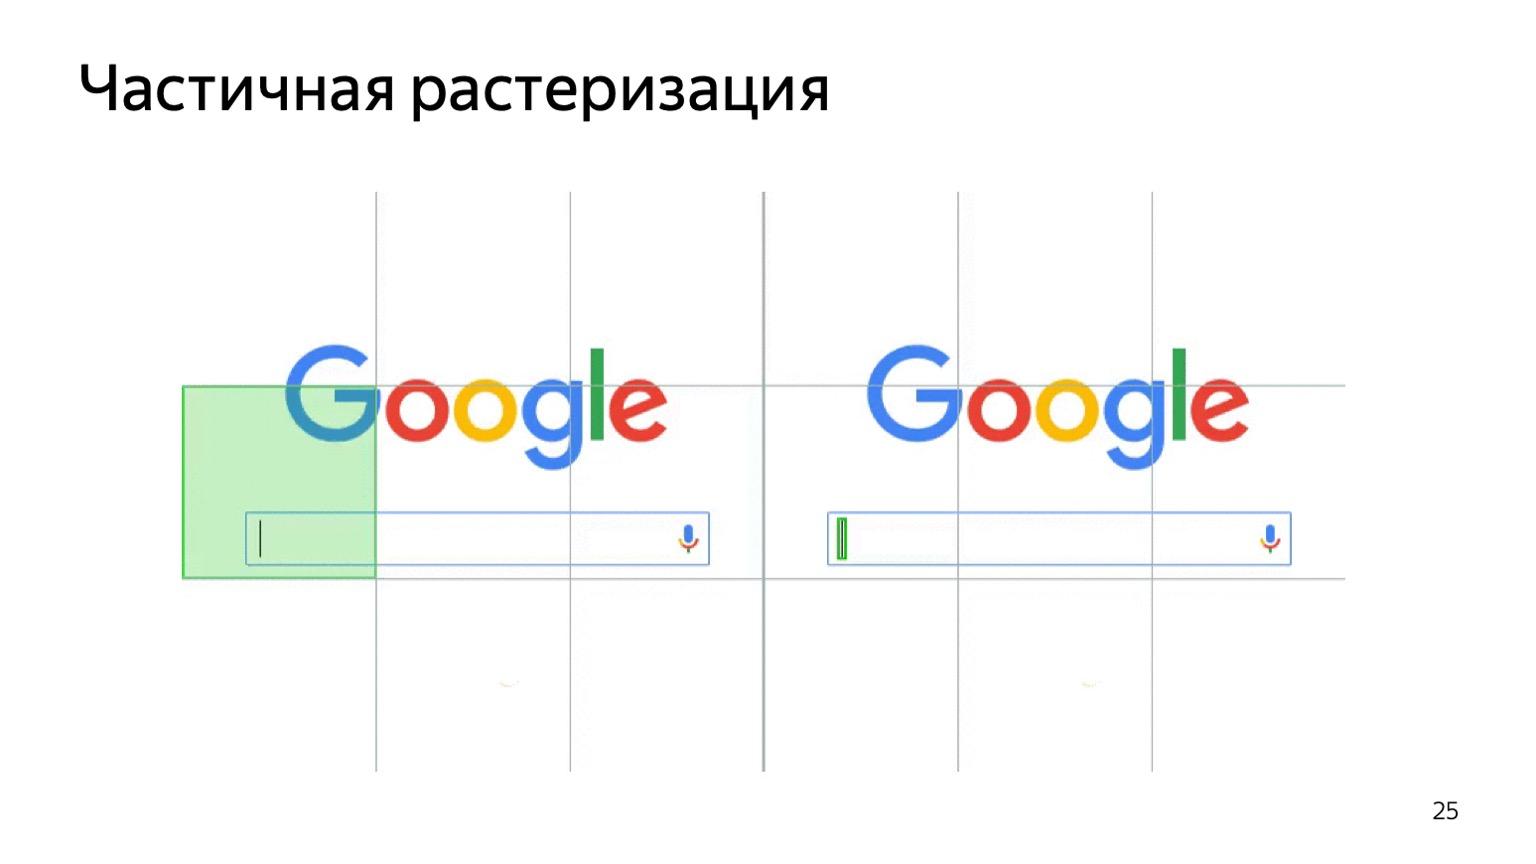 Как рисует браузер. Доклад Яндекса - 24